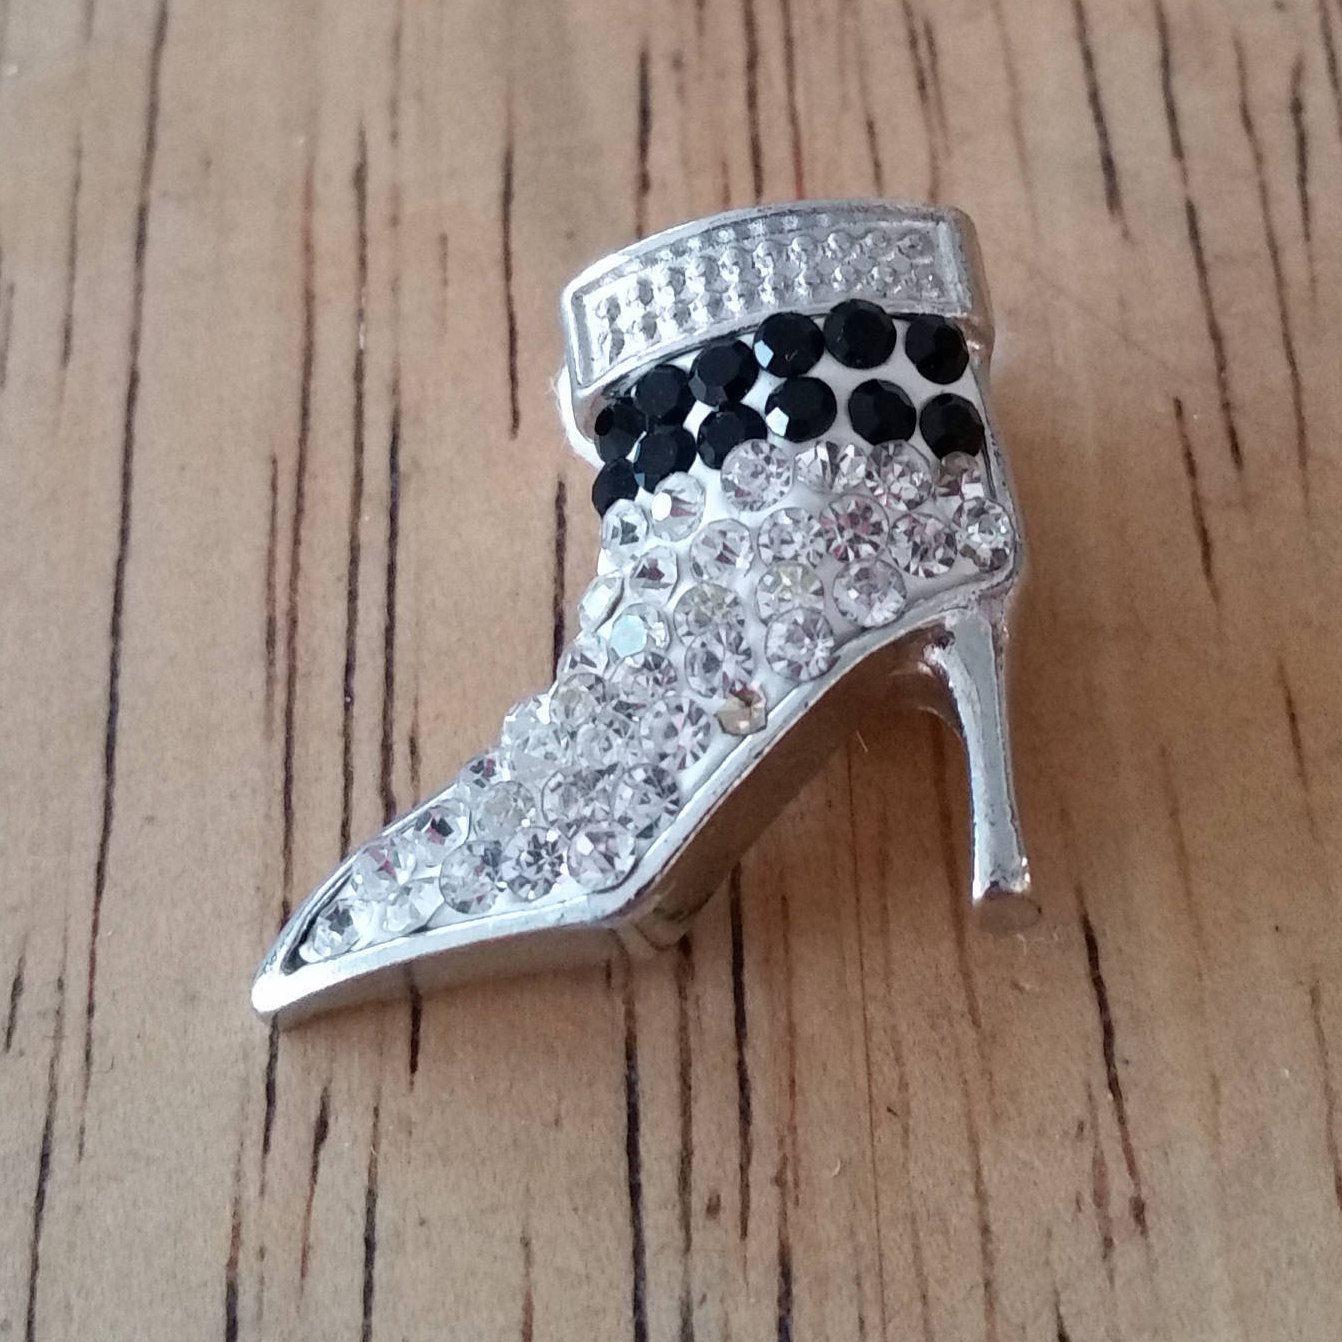 1 - Black & Clear Rhinestones High Heel Boot Shoe - Snap Charm - 18mm - Charm Chunk - Noosa - Silver Trim by GailsGiftHut on Etsy